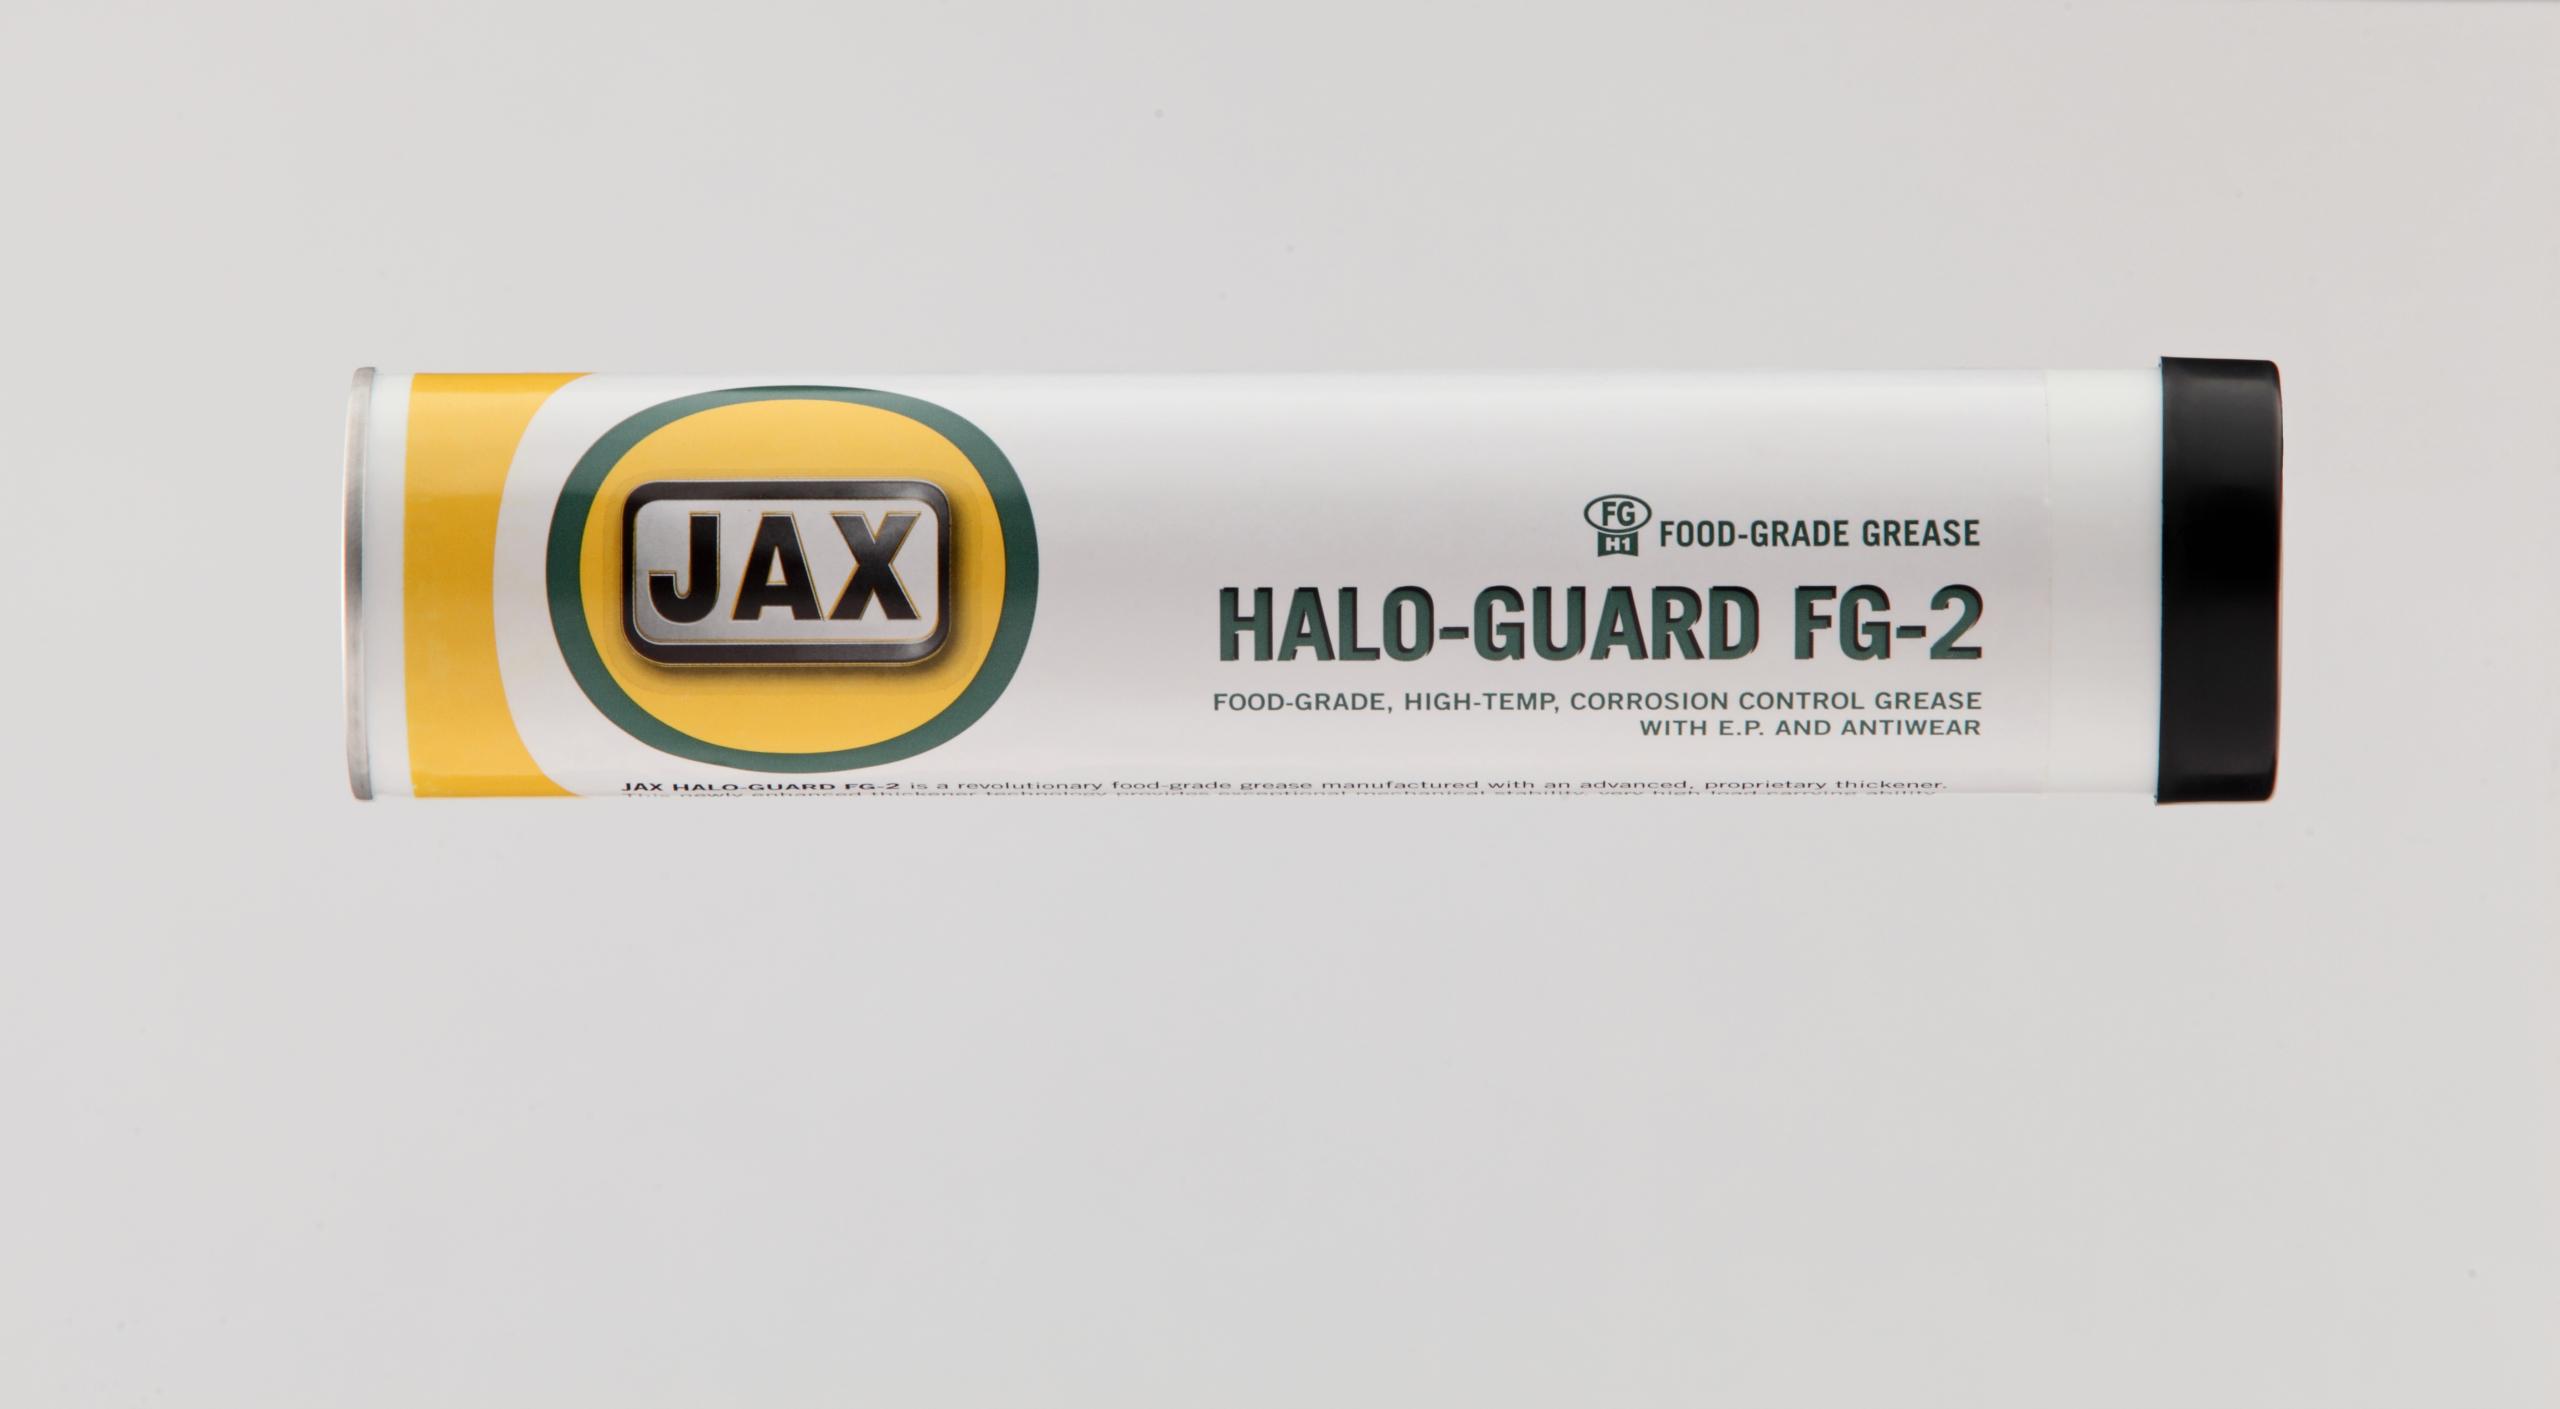 Halo-GuardFG-2Grease - ABIC Kemi AB